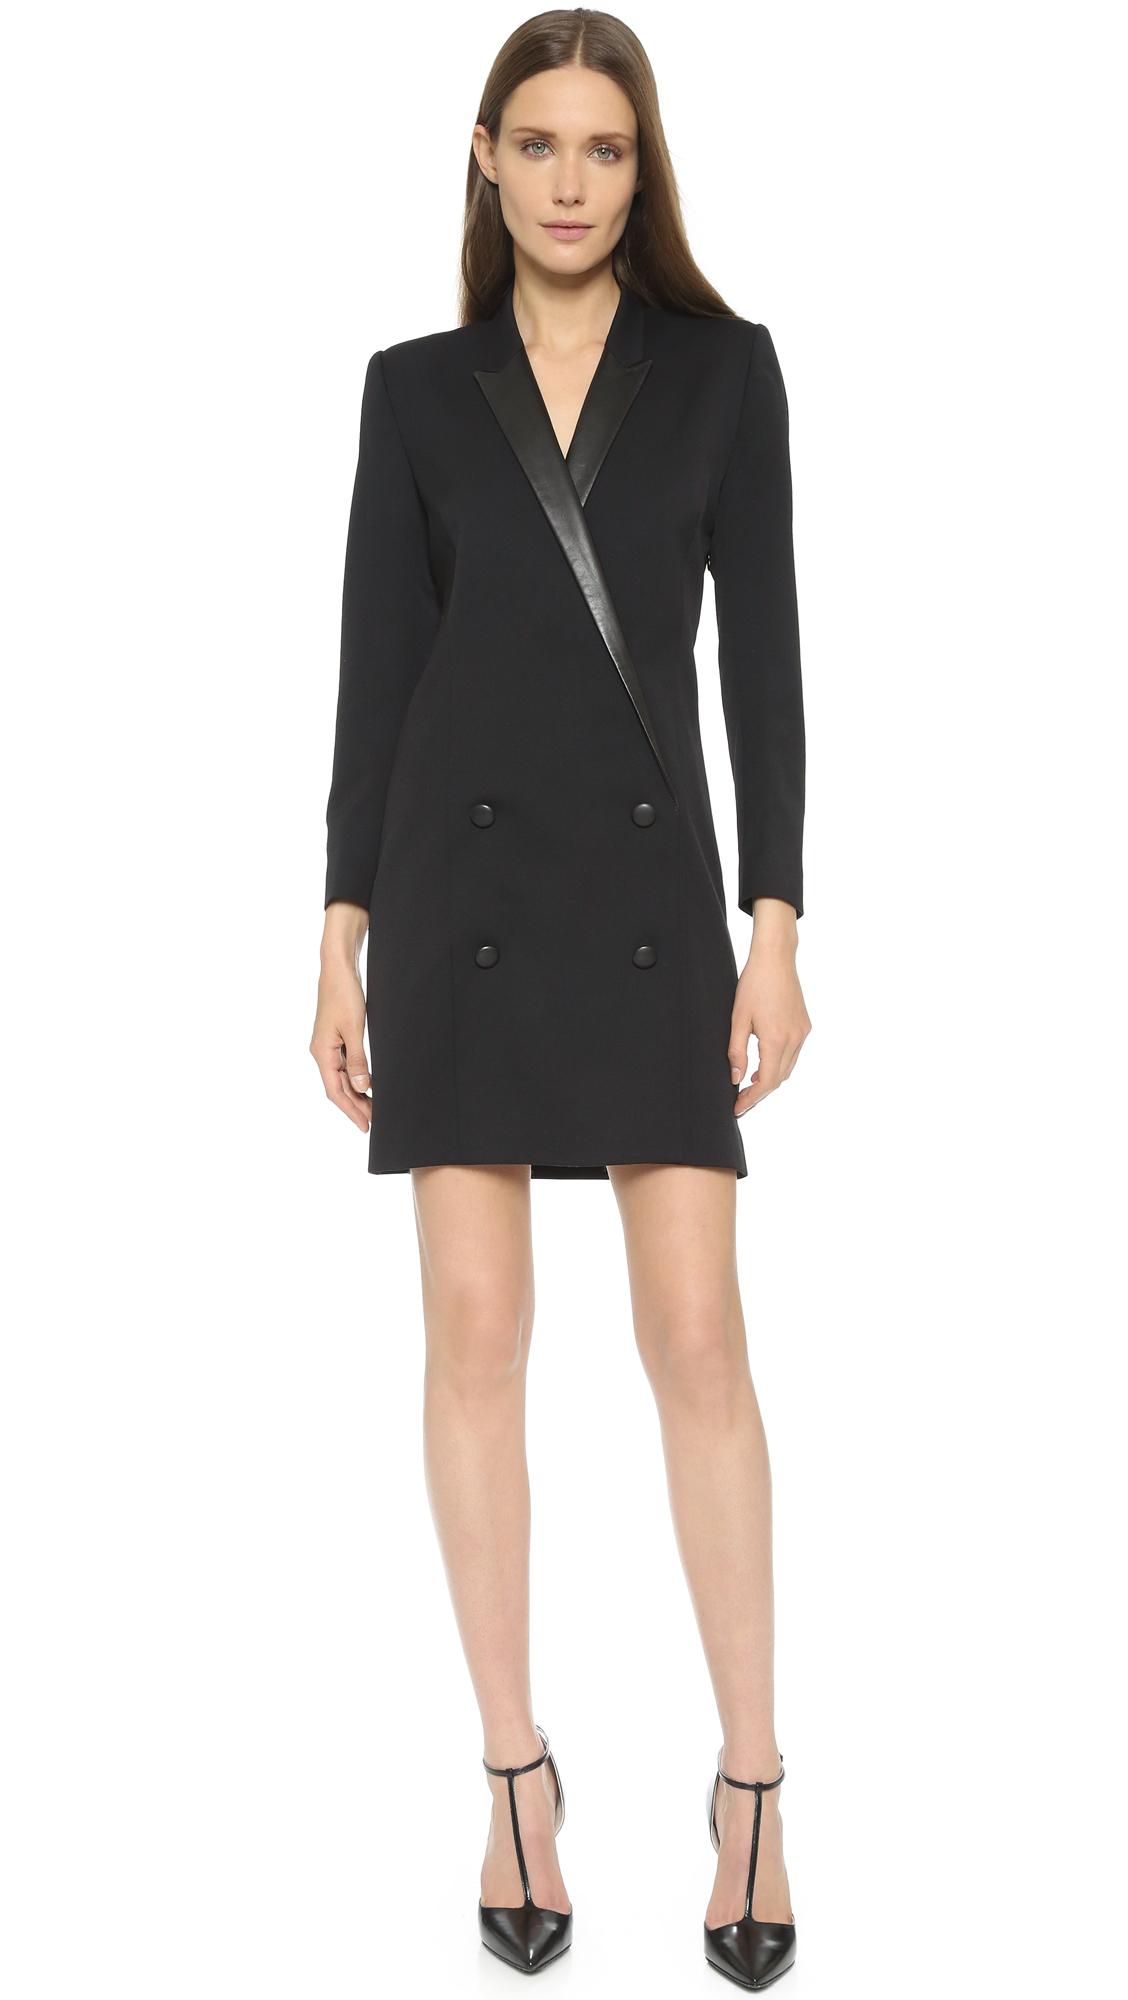 The kooples Coat Shaped Dress - Black in Black | Lyst